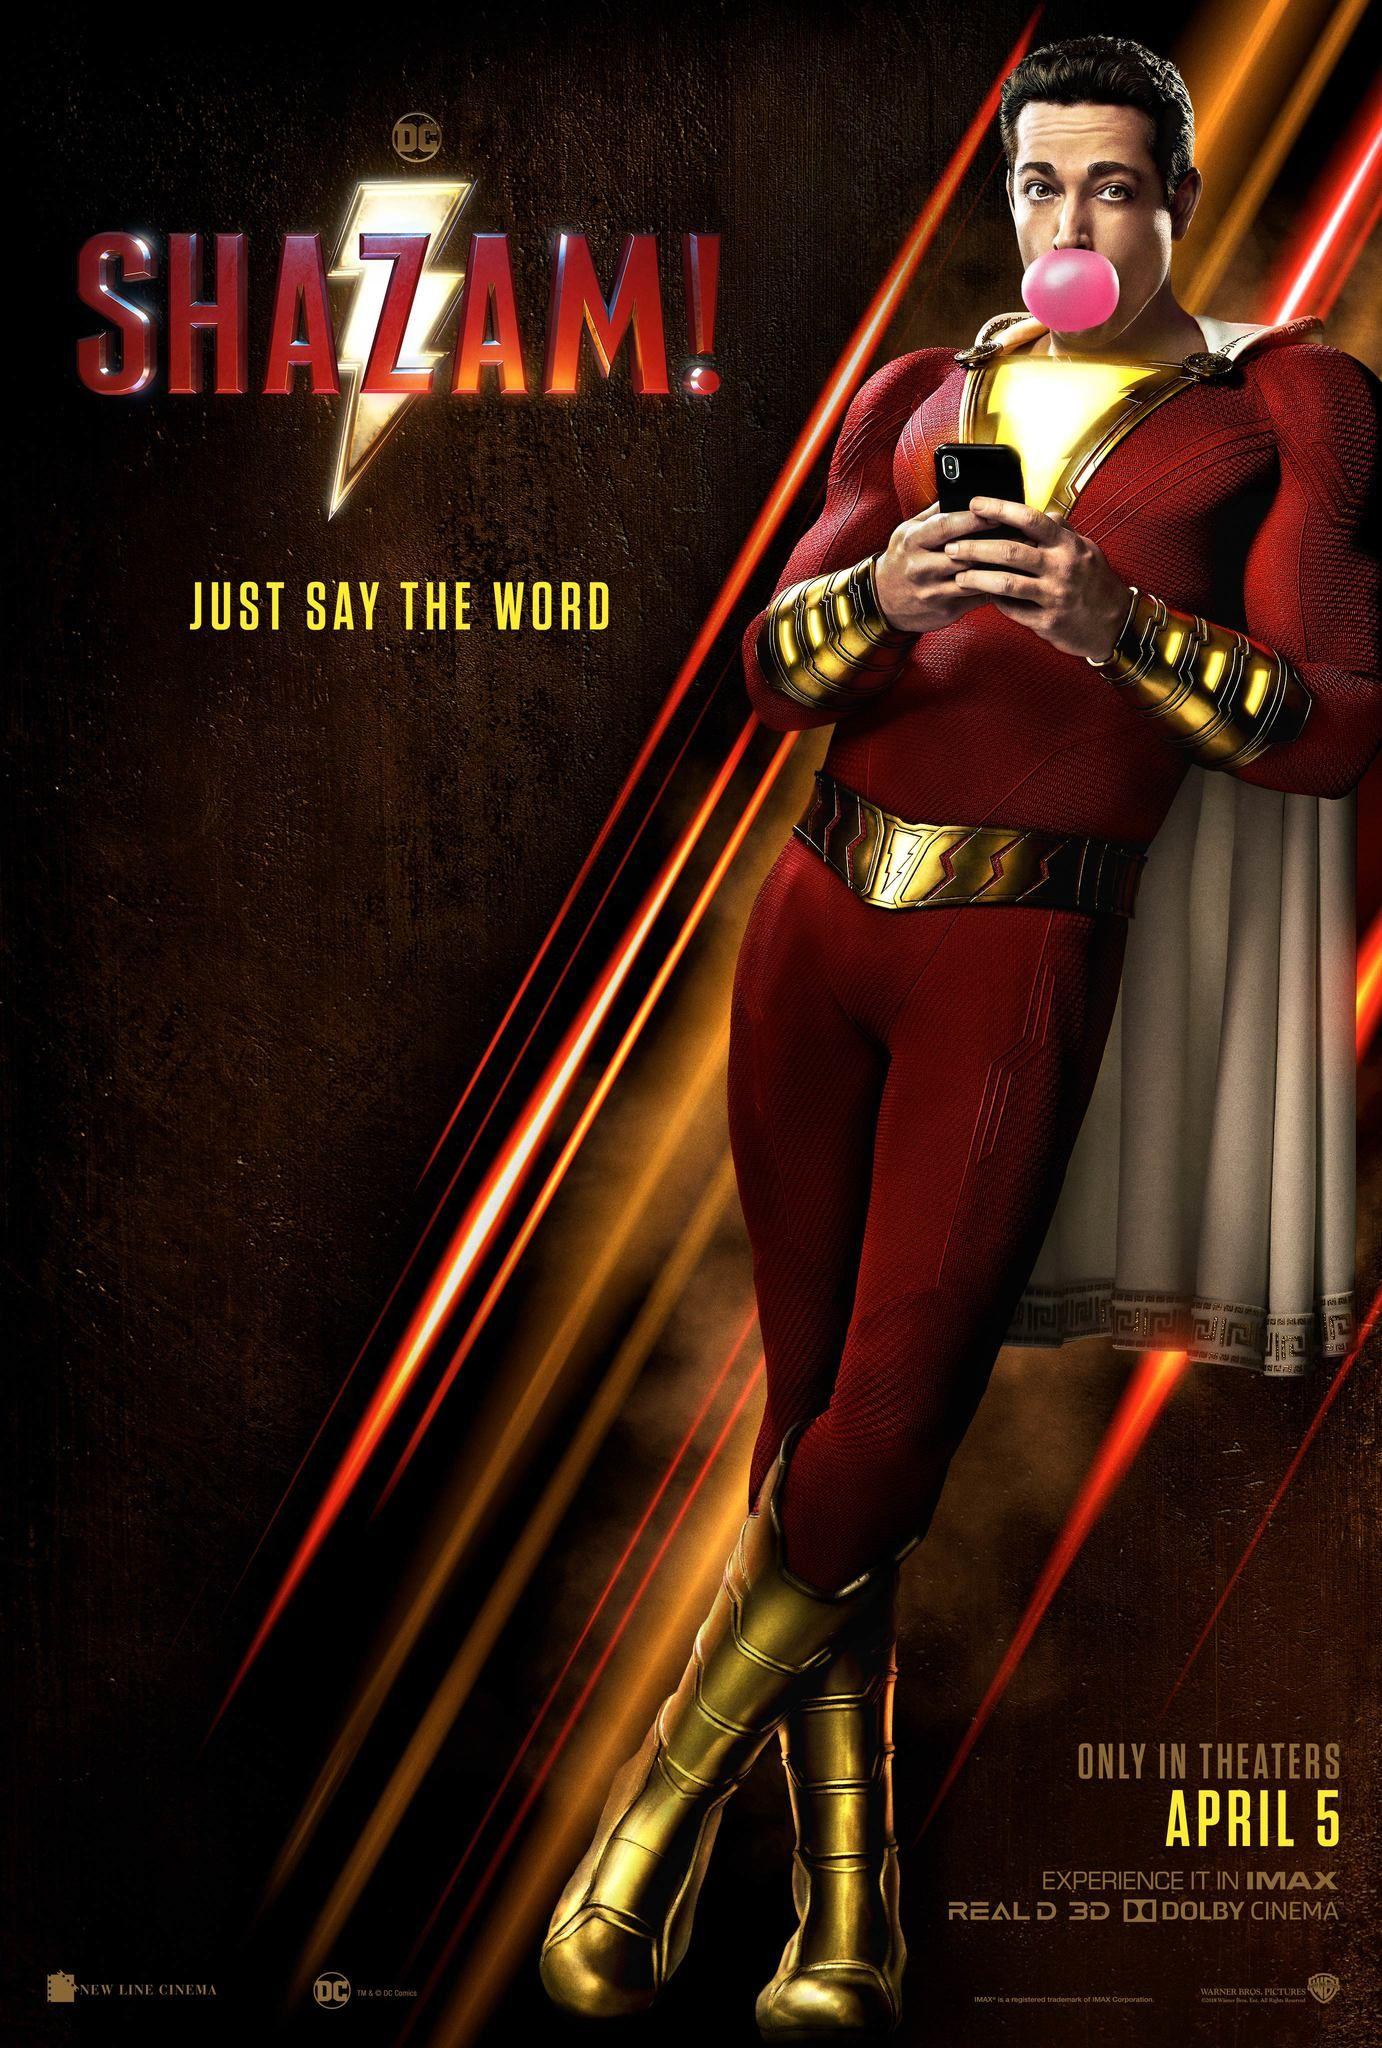 ADVANCE SCREENING SHAZAM! Shazam movie, Zachary levi